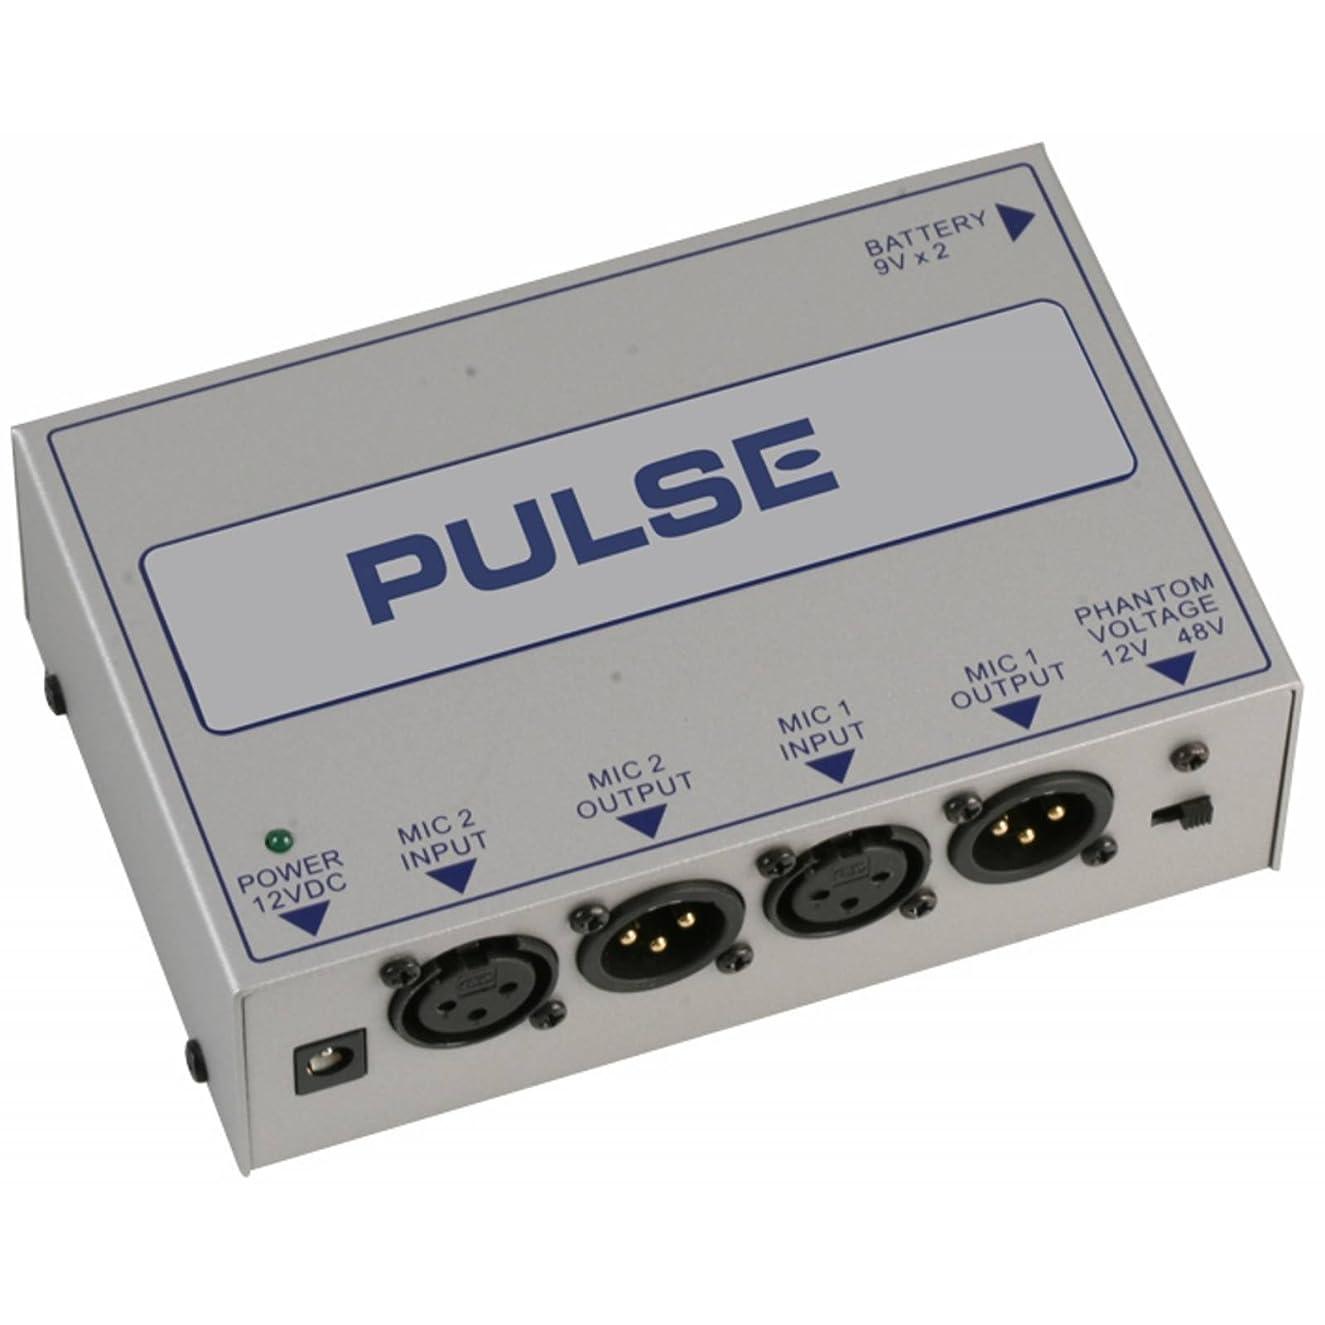 PULSE - Phantom Power Supply, Dual